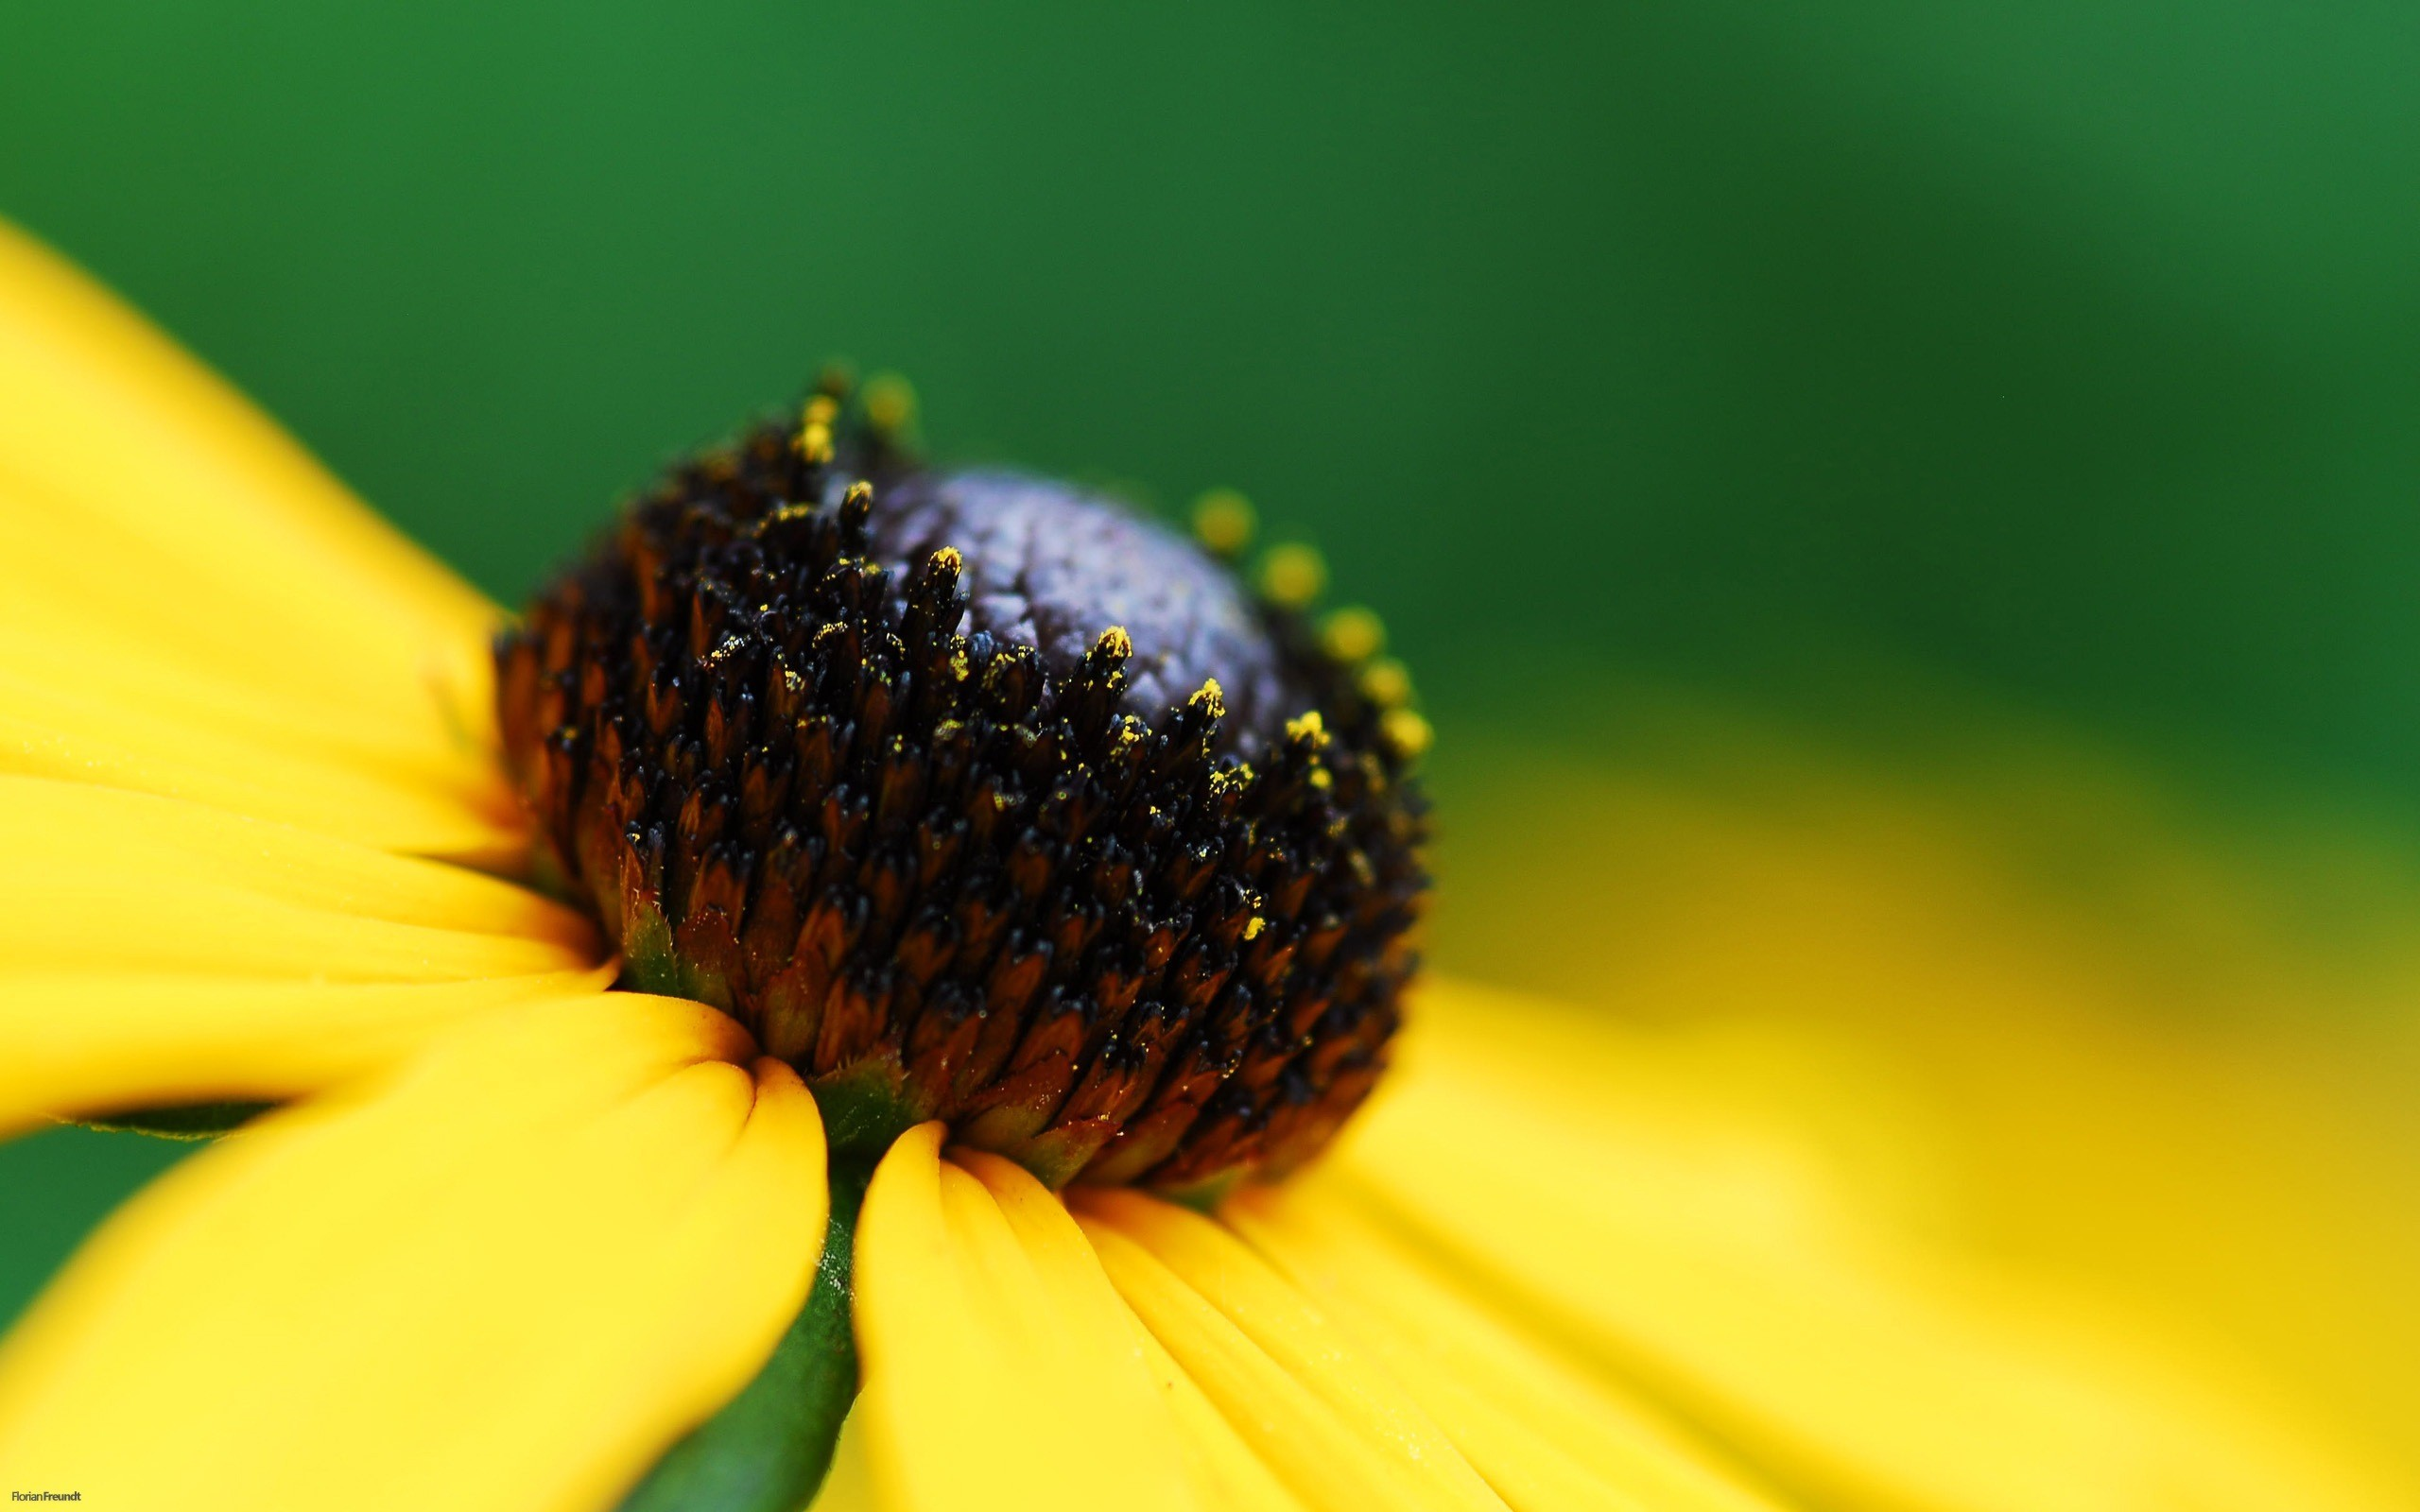 цветы макро желтые flowers macro yellow  № 910247 бесплатно